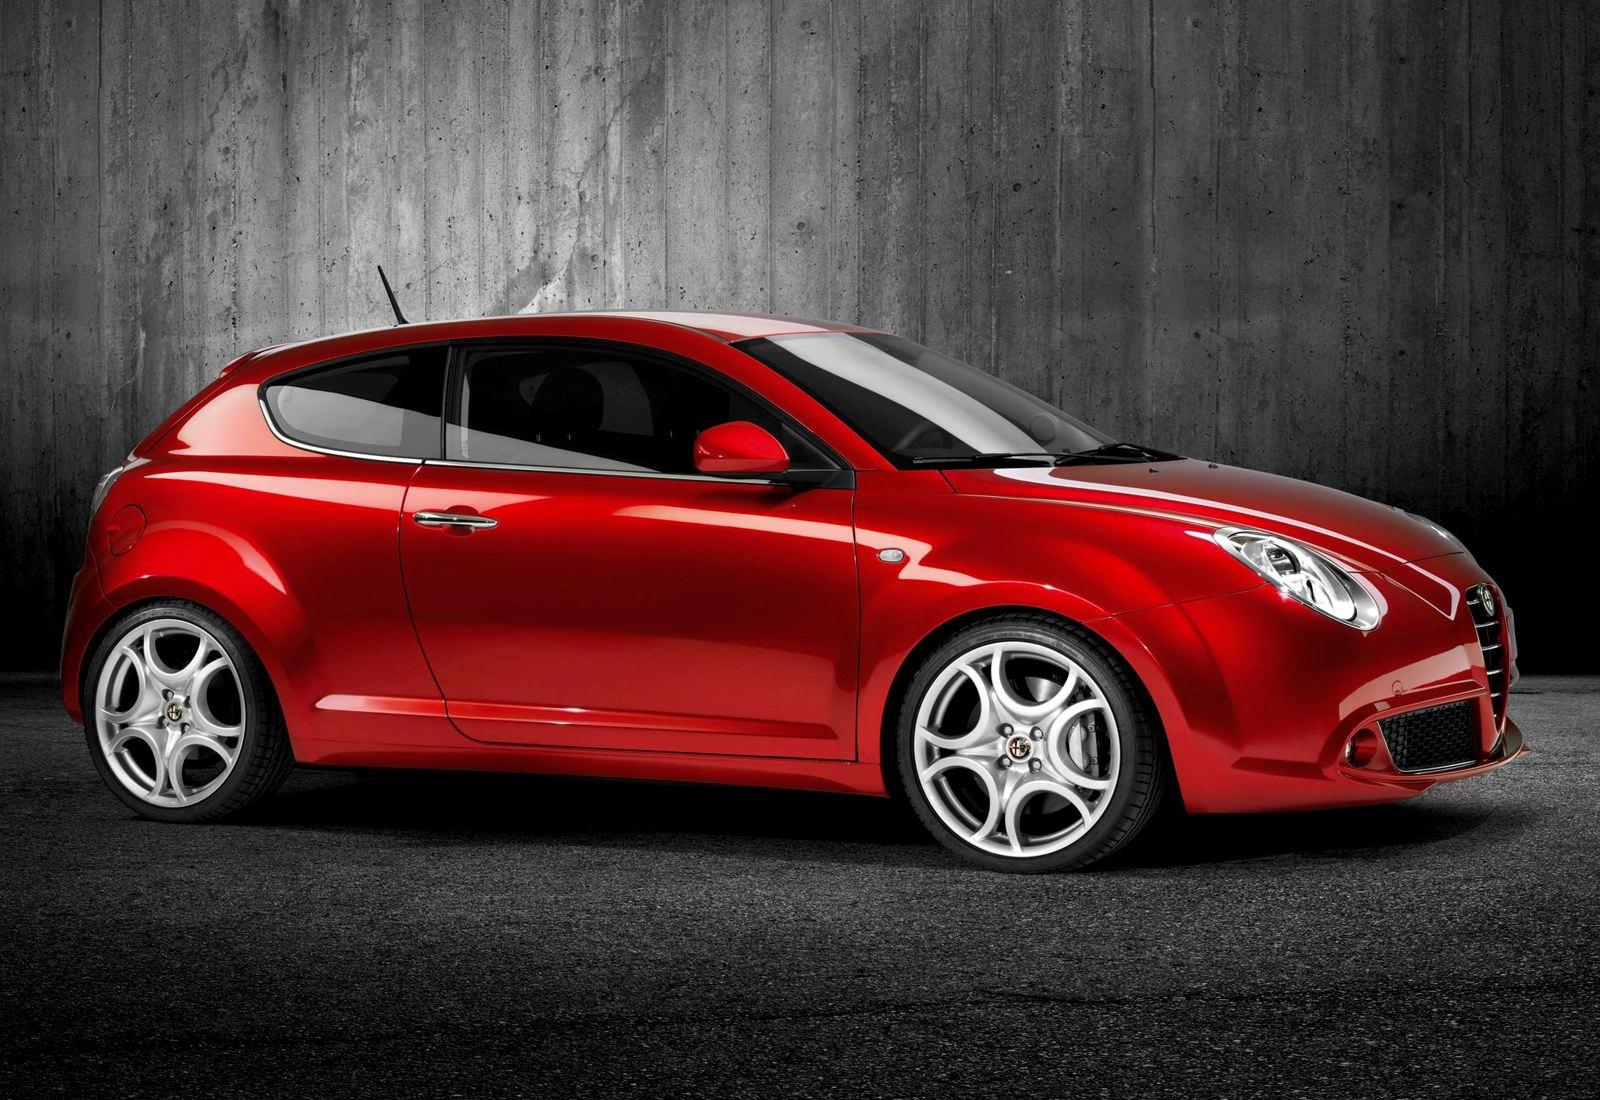 Alfa Romeo Mito 2013 Photo - 1